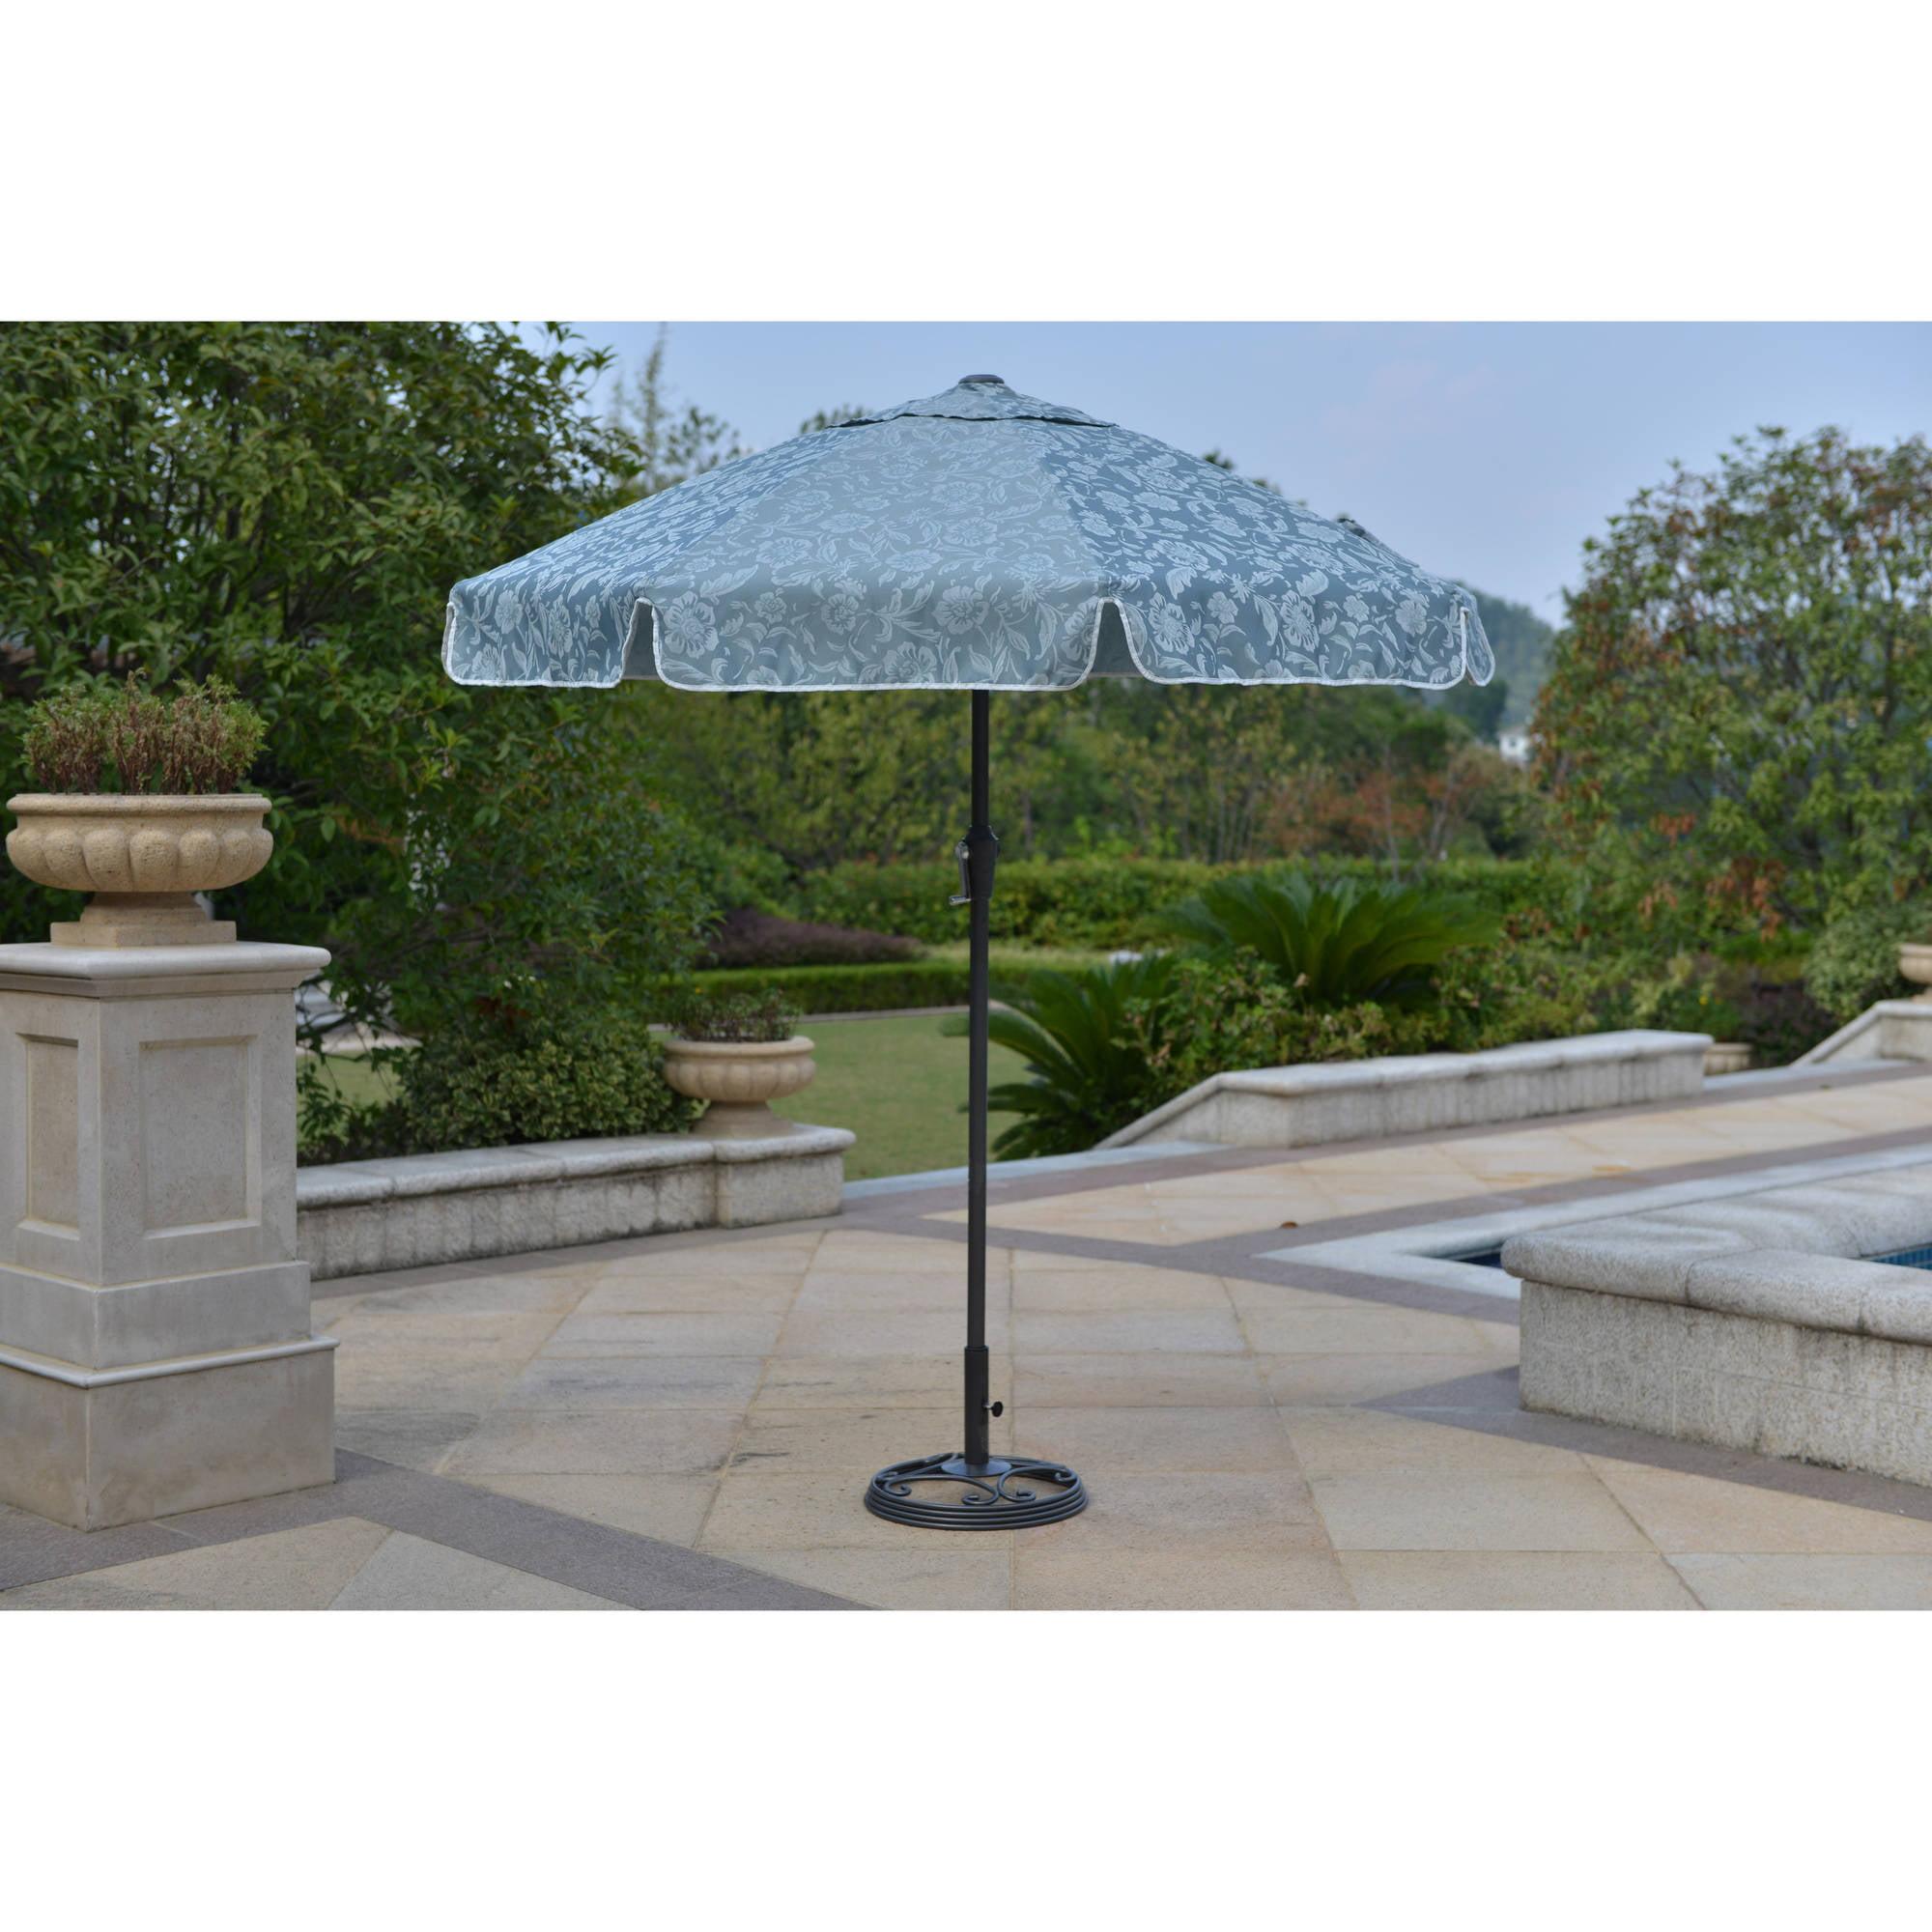 Mainstays Willow Springs 7' Garden Umbrella, Blue